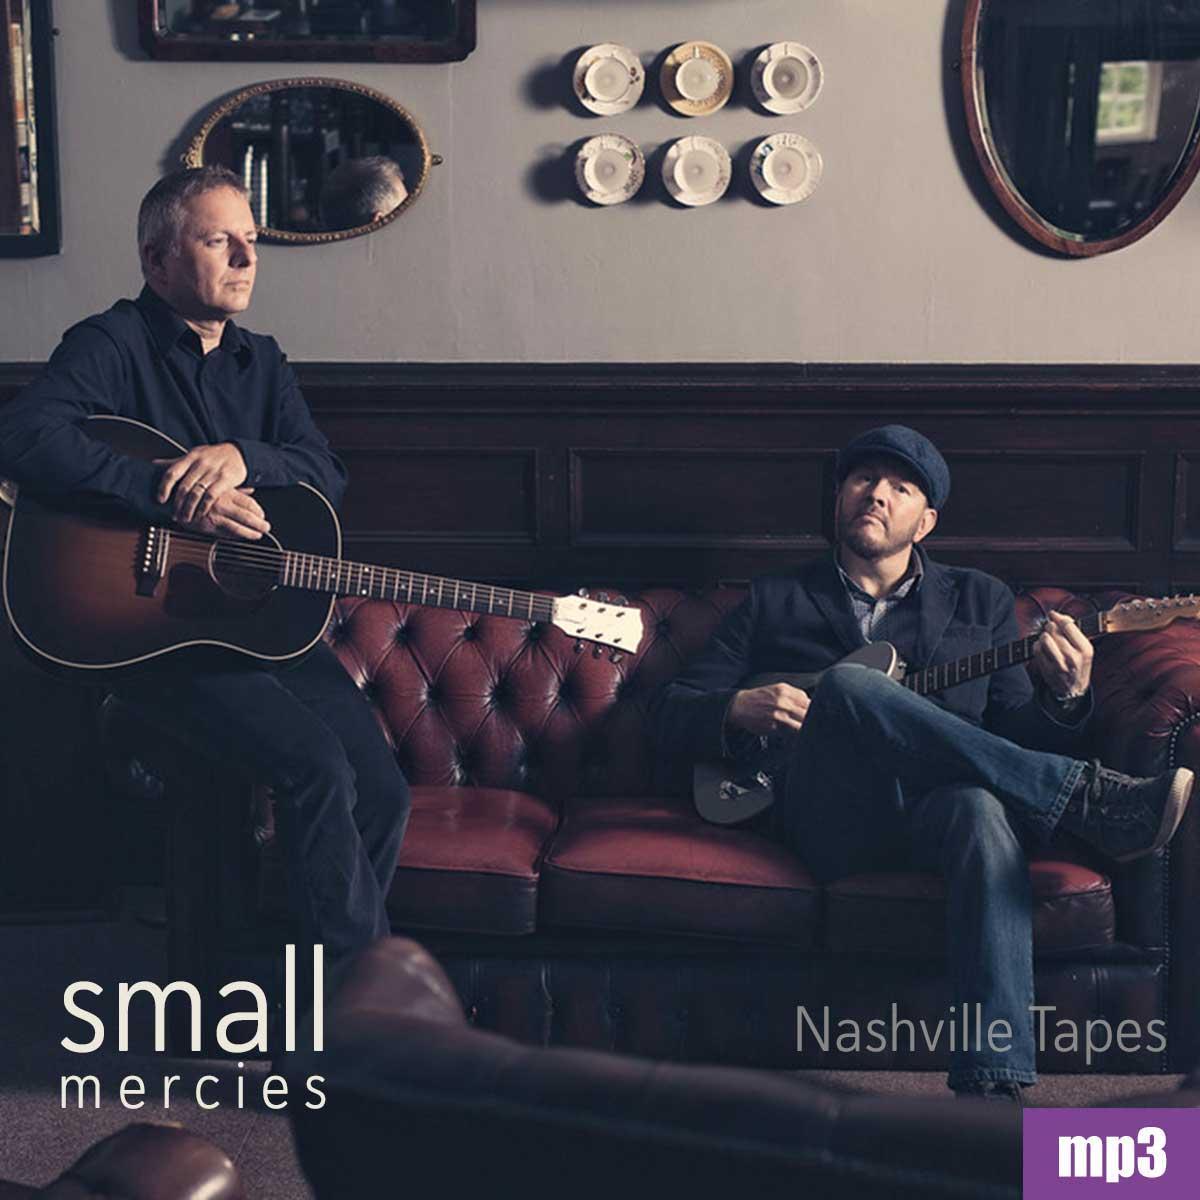 Carl Moreton Music Small Mercies Nashville Tapes MP3 album Download